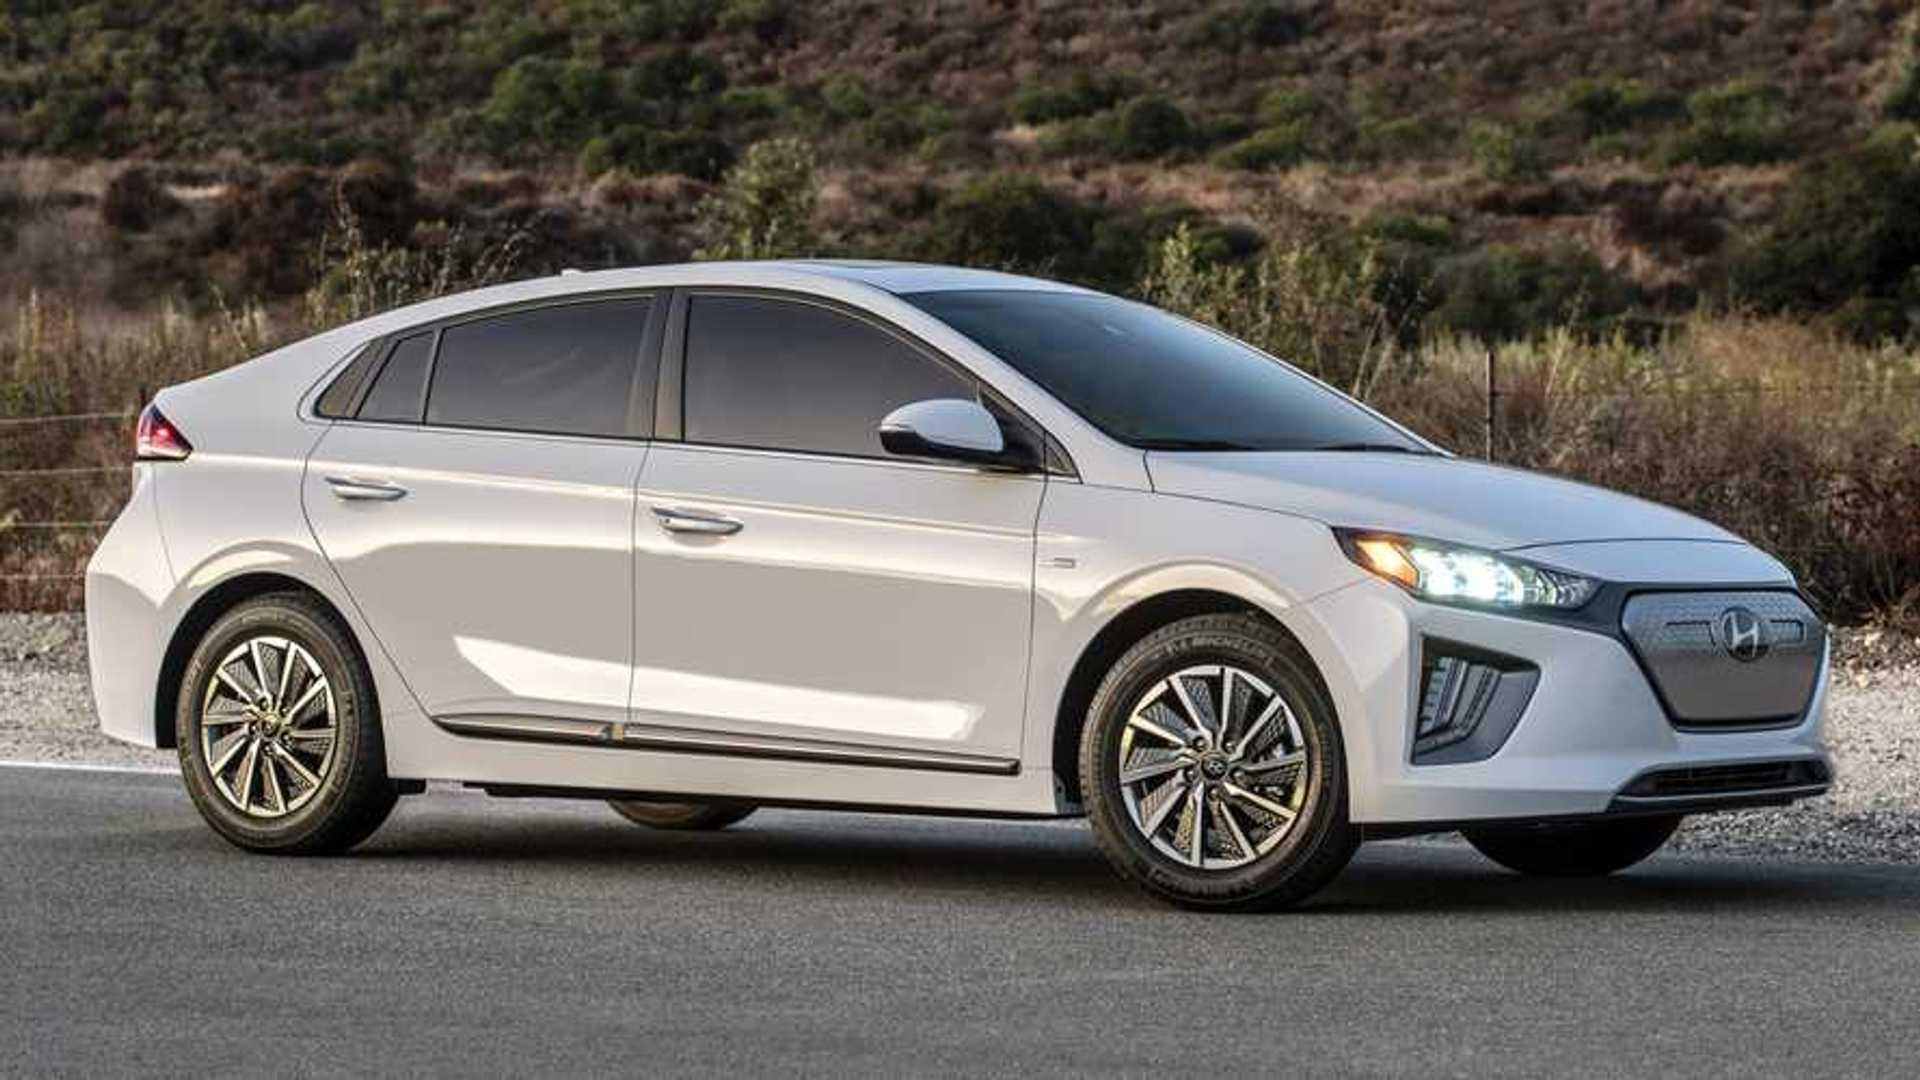 2020 Hyundai Ioniq Debuts With 170 Miles Of EV Range, Refreshed Looks